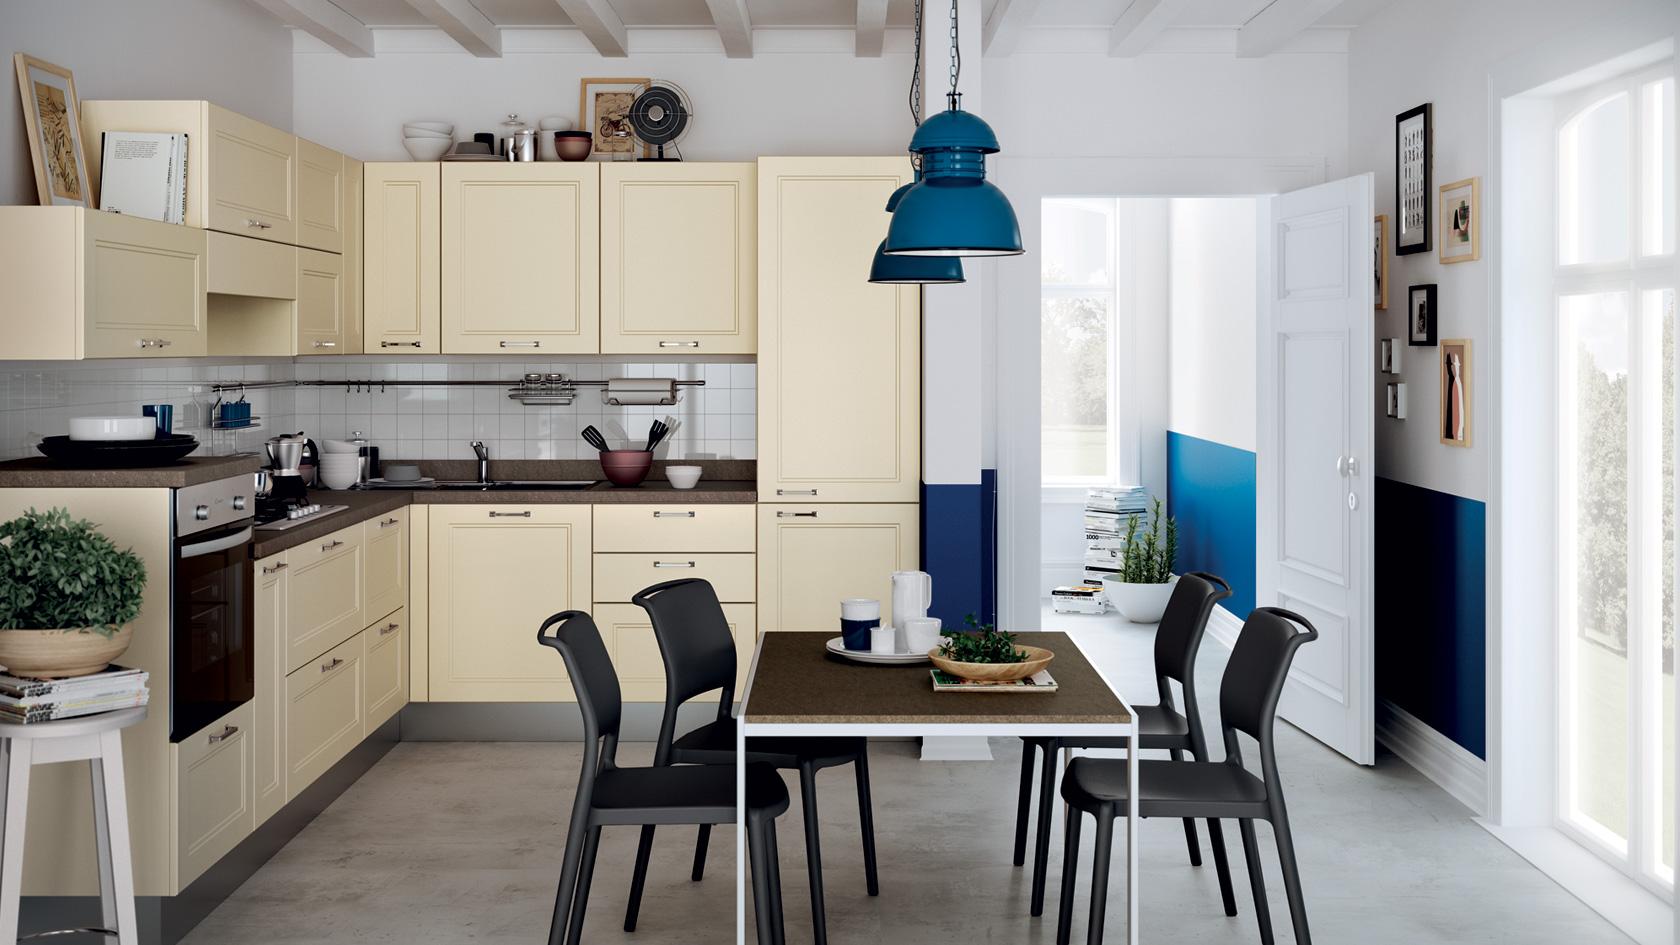 Colony kitchen dillon amber dane kitchens barbados - Mesas de trabajo cocina ...